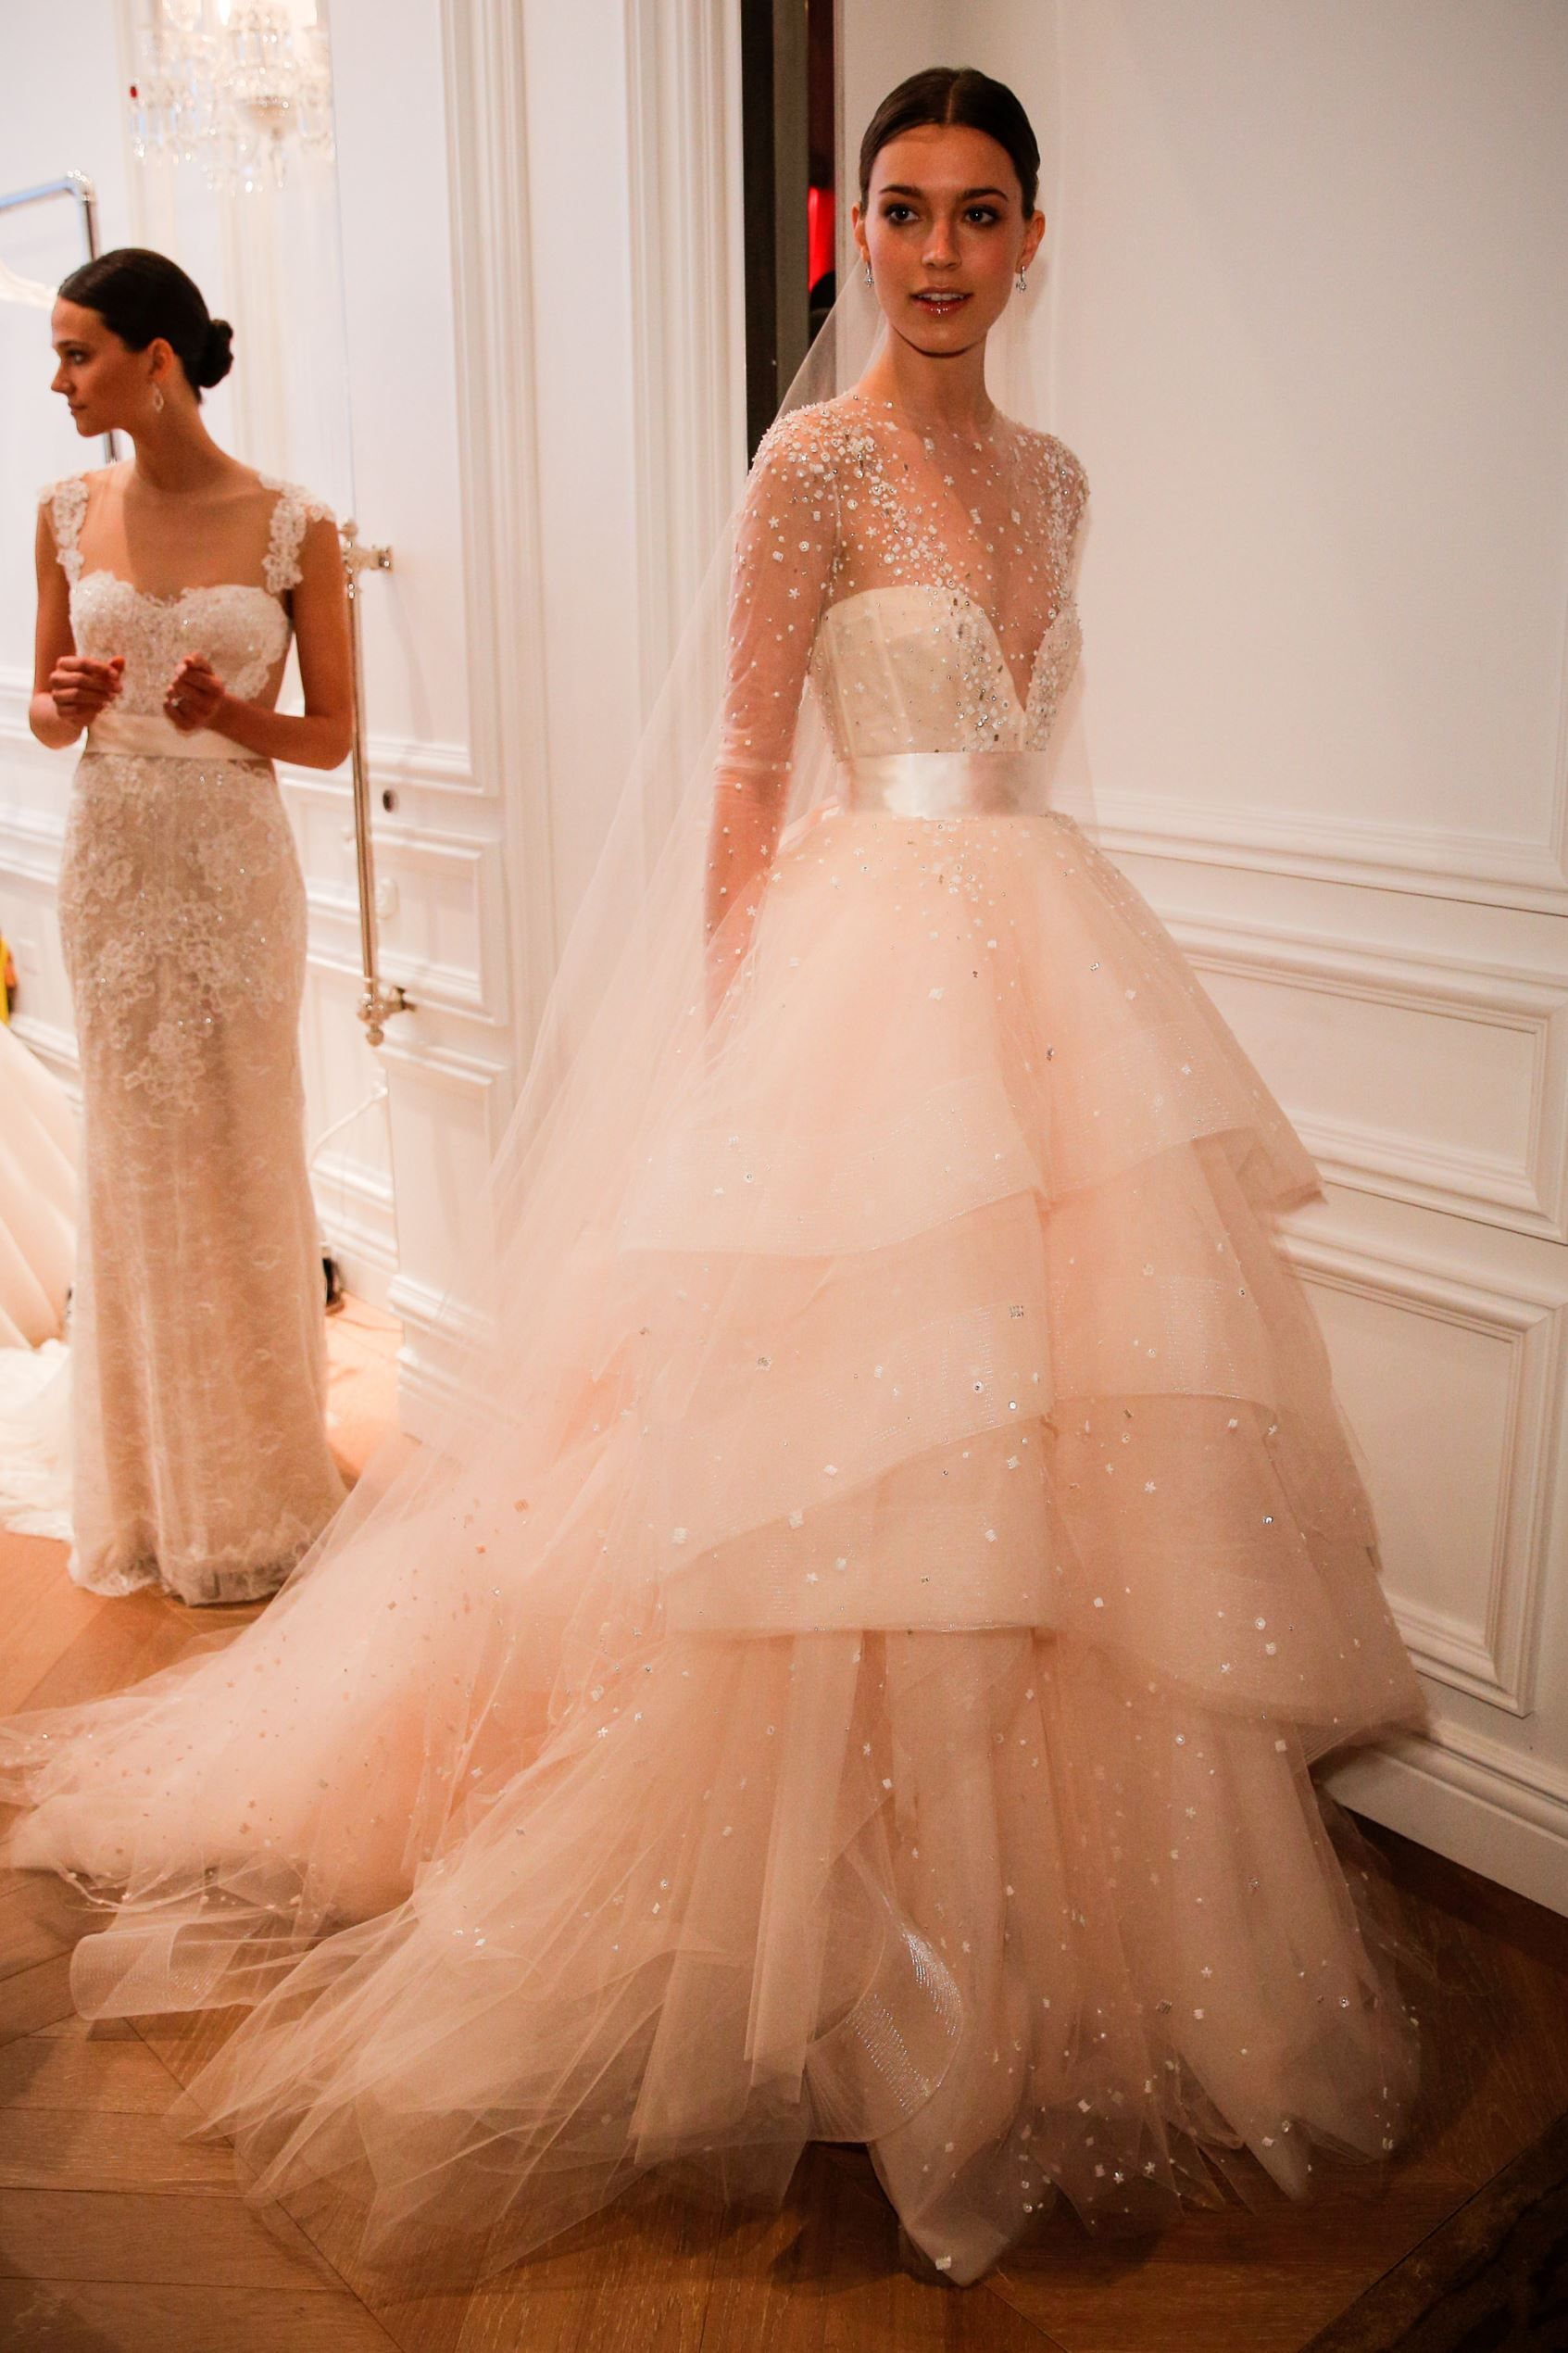 Thomas Concordia/Getty Images Monique Lhuillier | Wedding ...